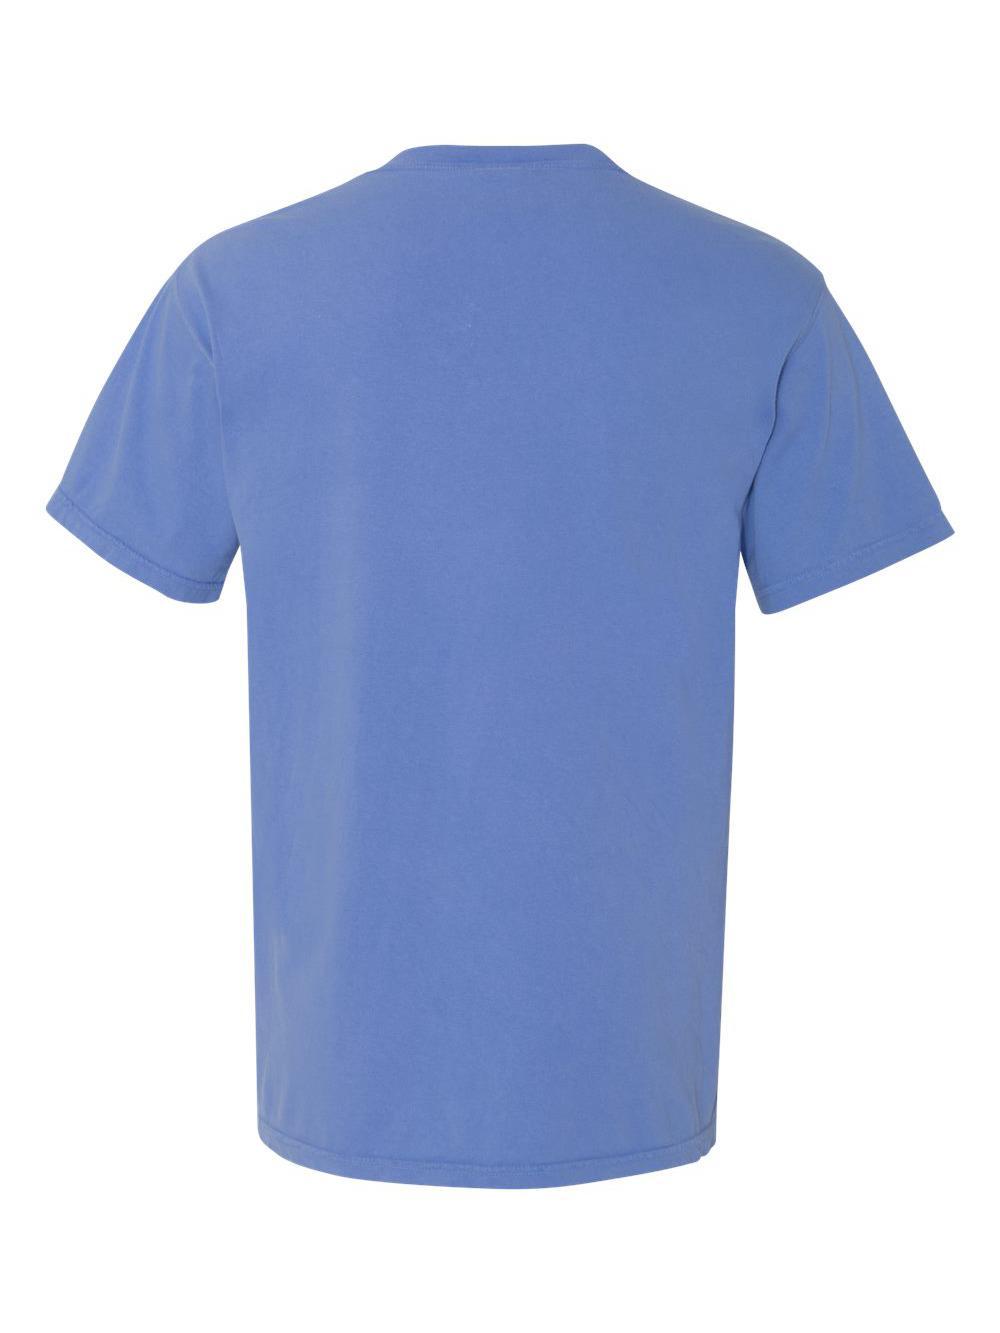 Comfort-Colors-Garment-Dyed-Heavyweight-Ringspun-Short-Sleeve-Shirt-1717 thumbnail 94